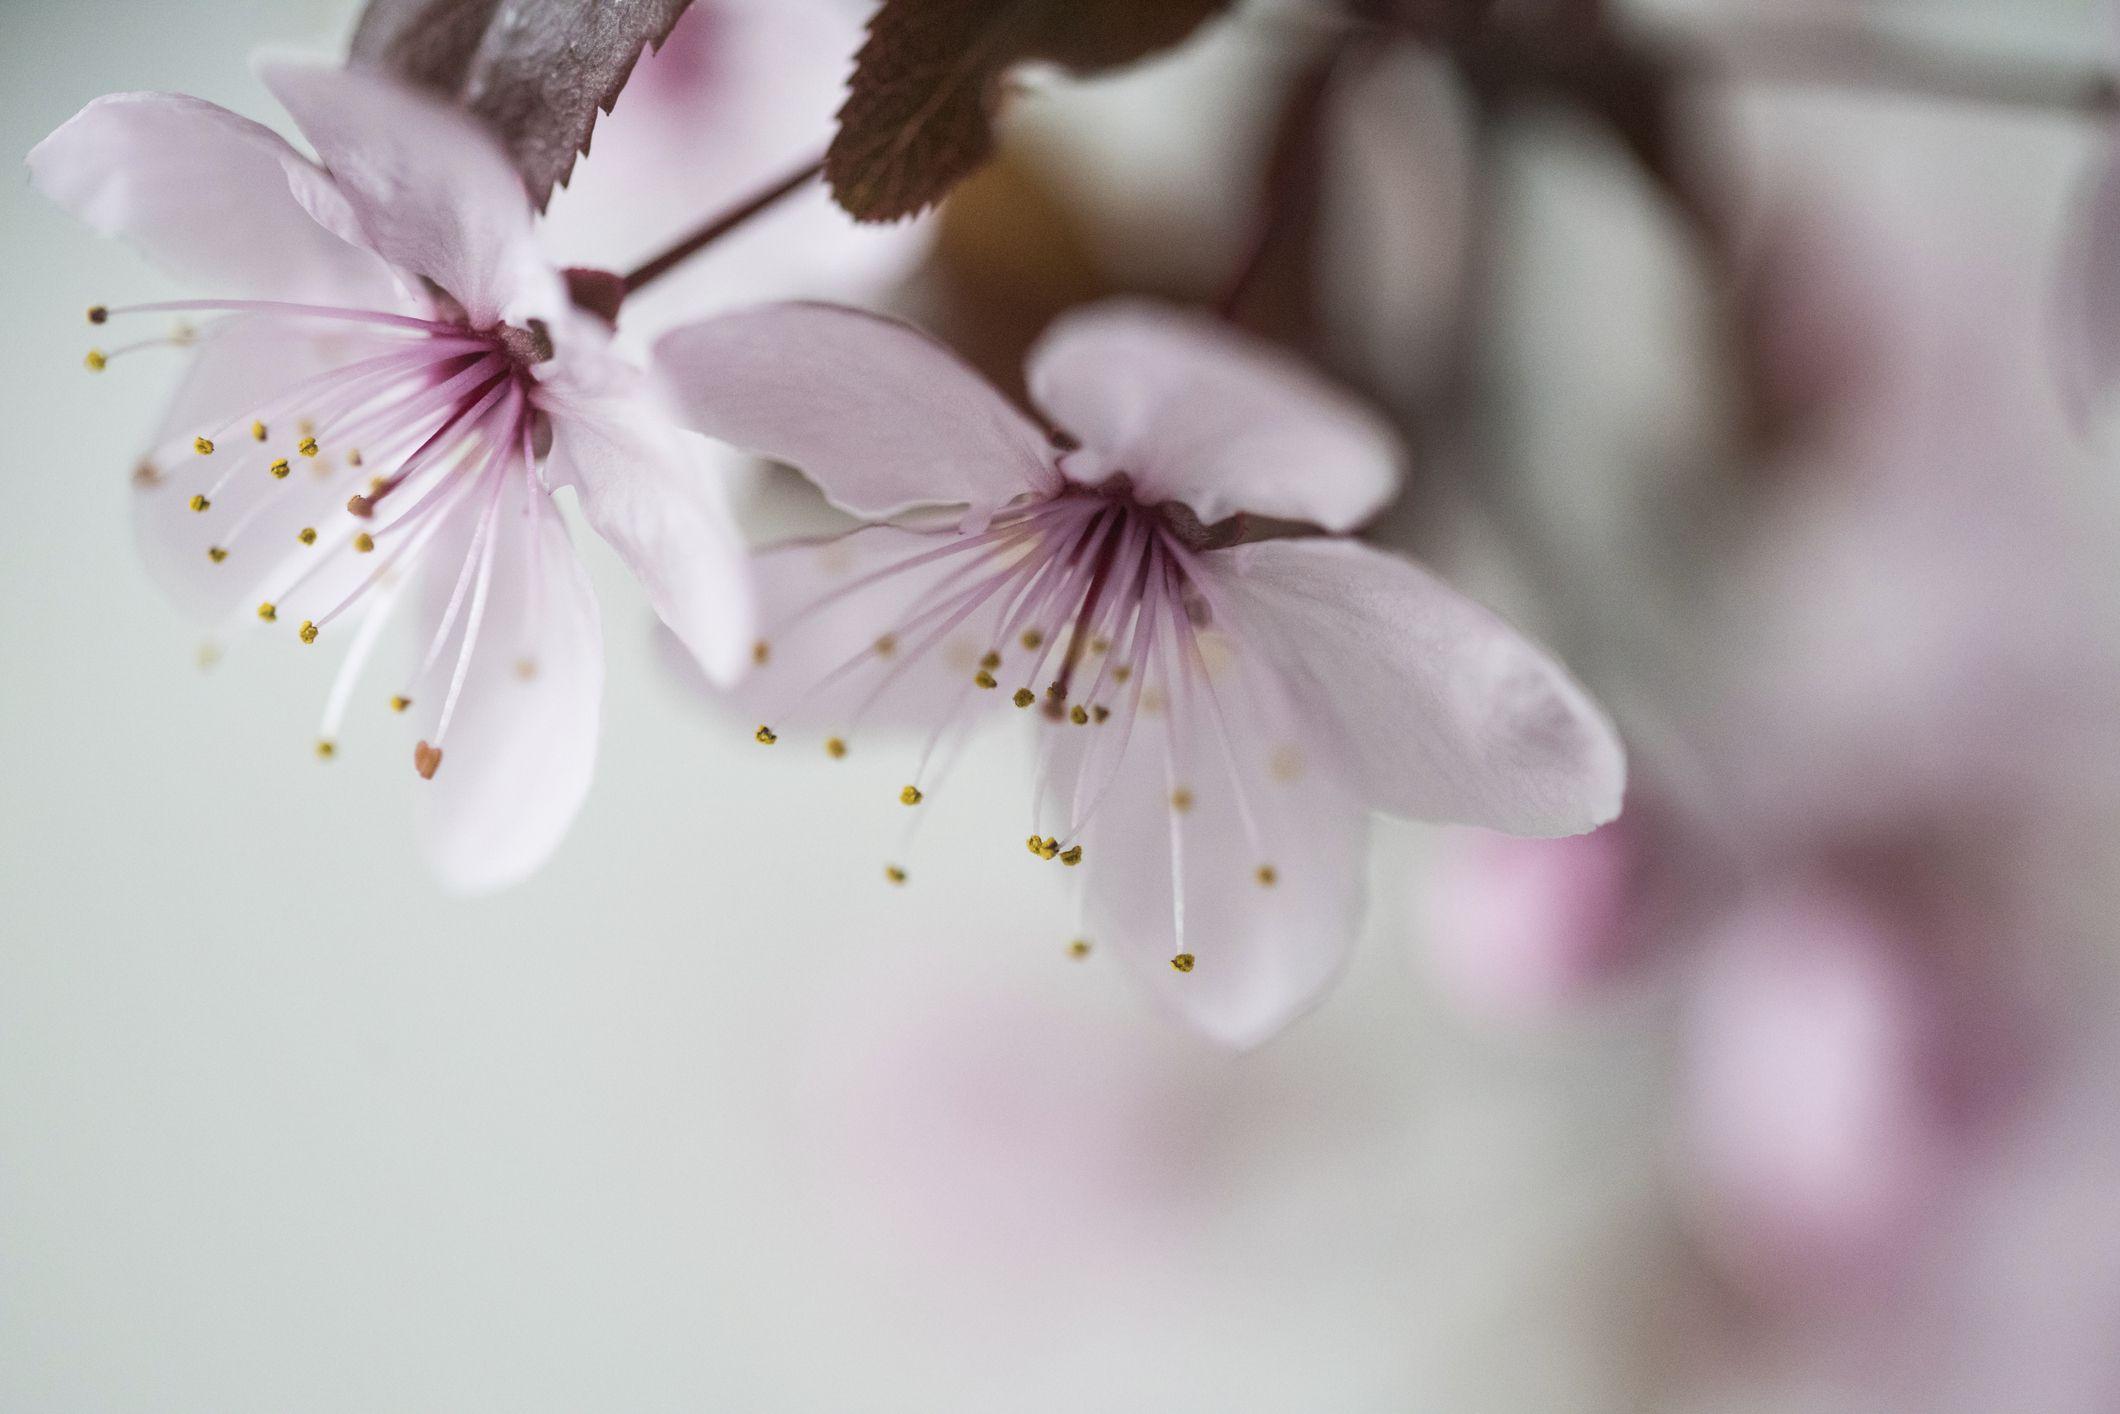 41. Apple Blossom - Michigan